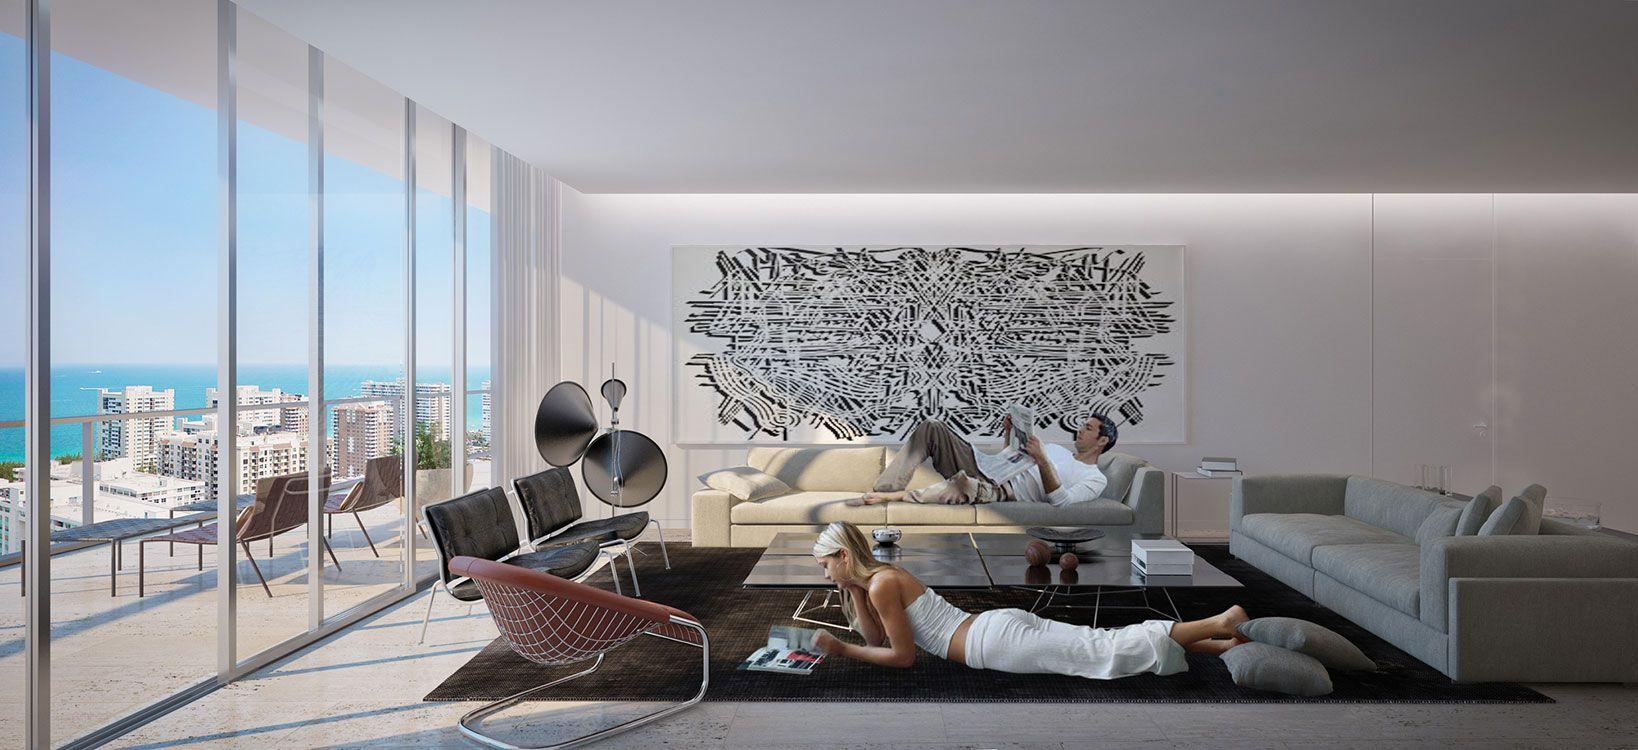 BEACHWALK | Luxury Resort condominiums & Beach Club